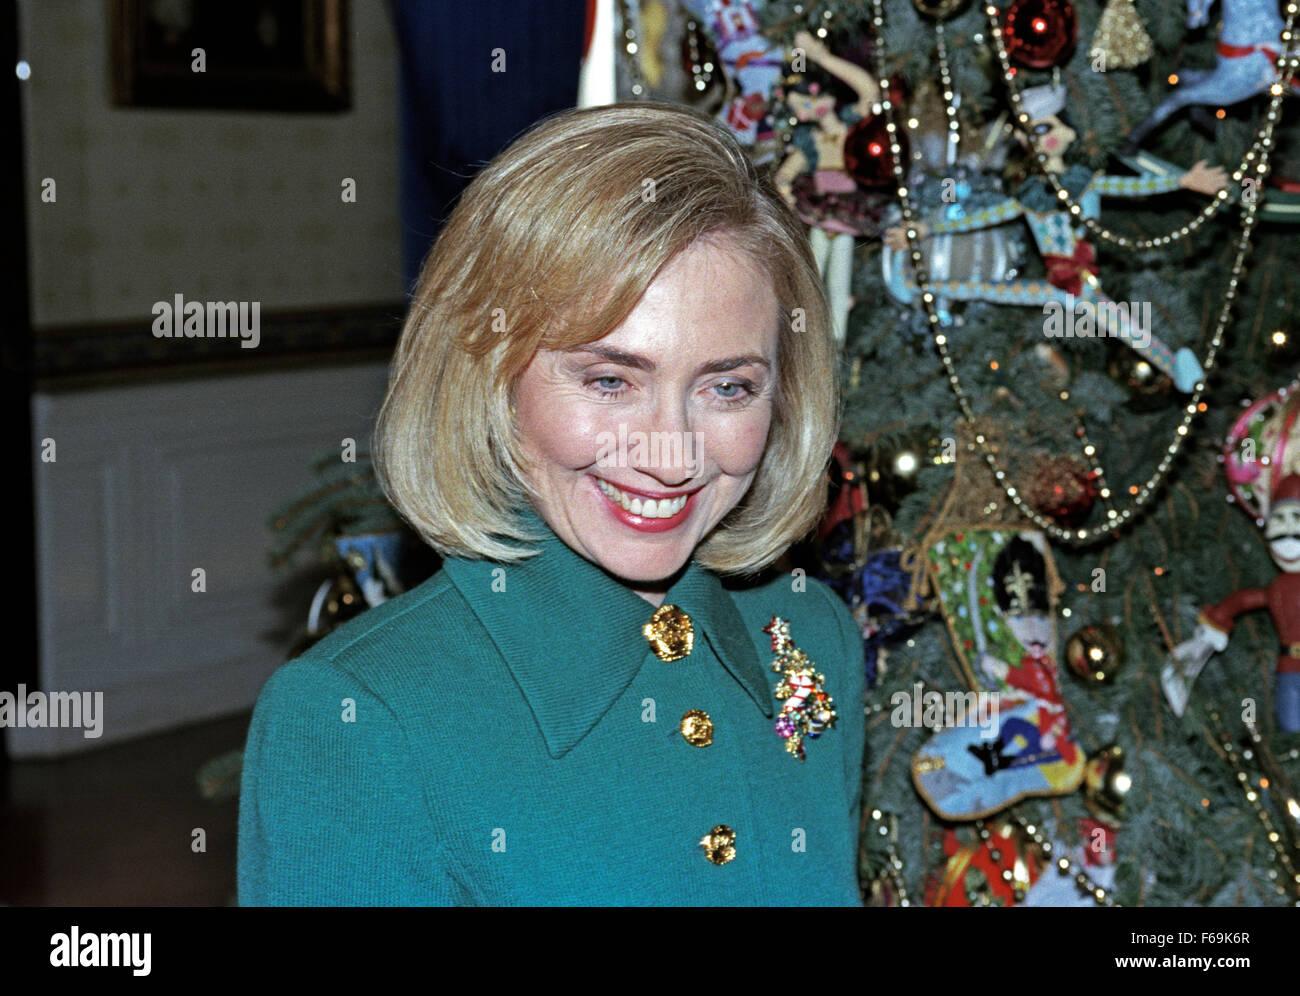 Hillary Clinton Christmas Tree Stock Photos & Hillary Clinton ...